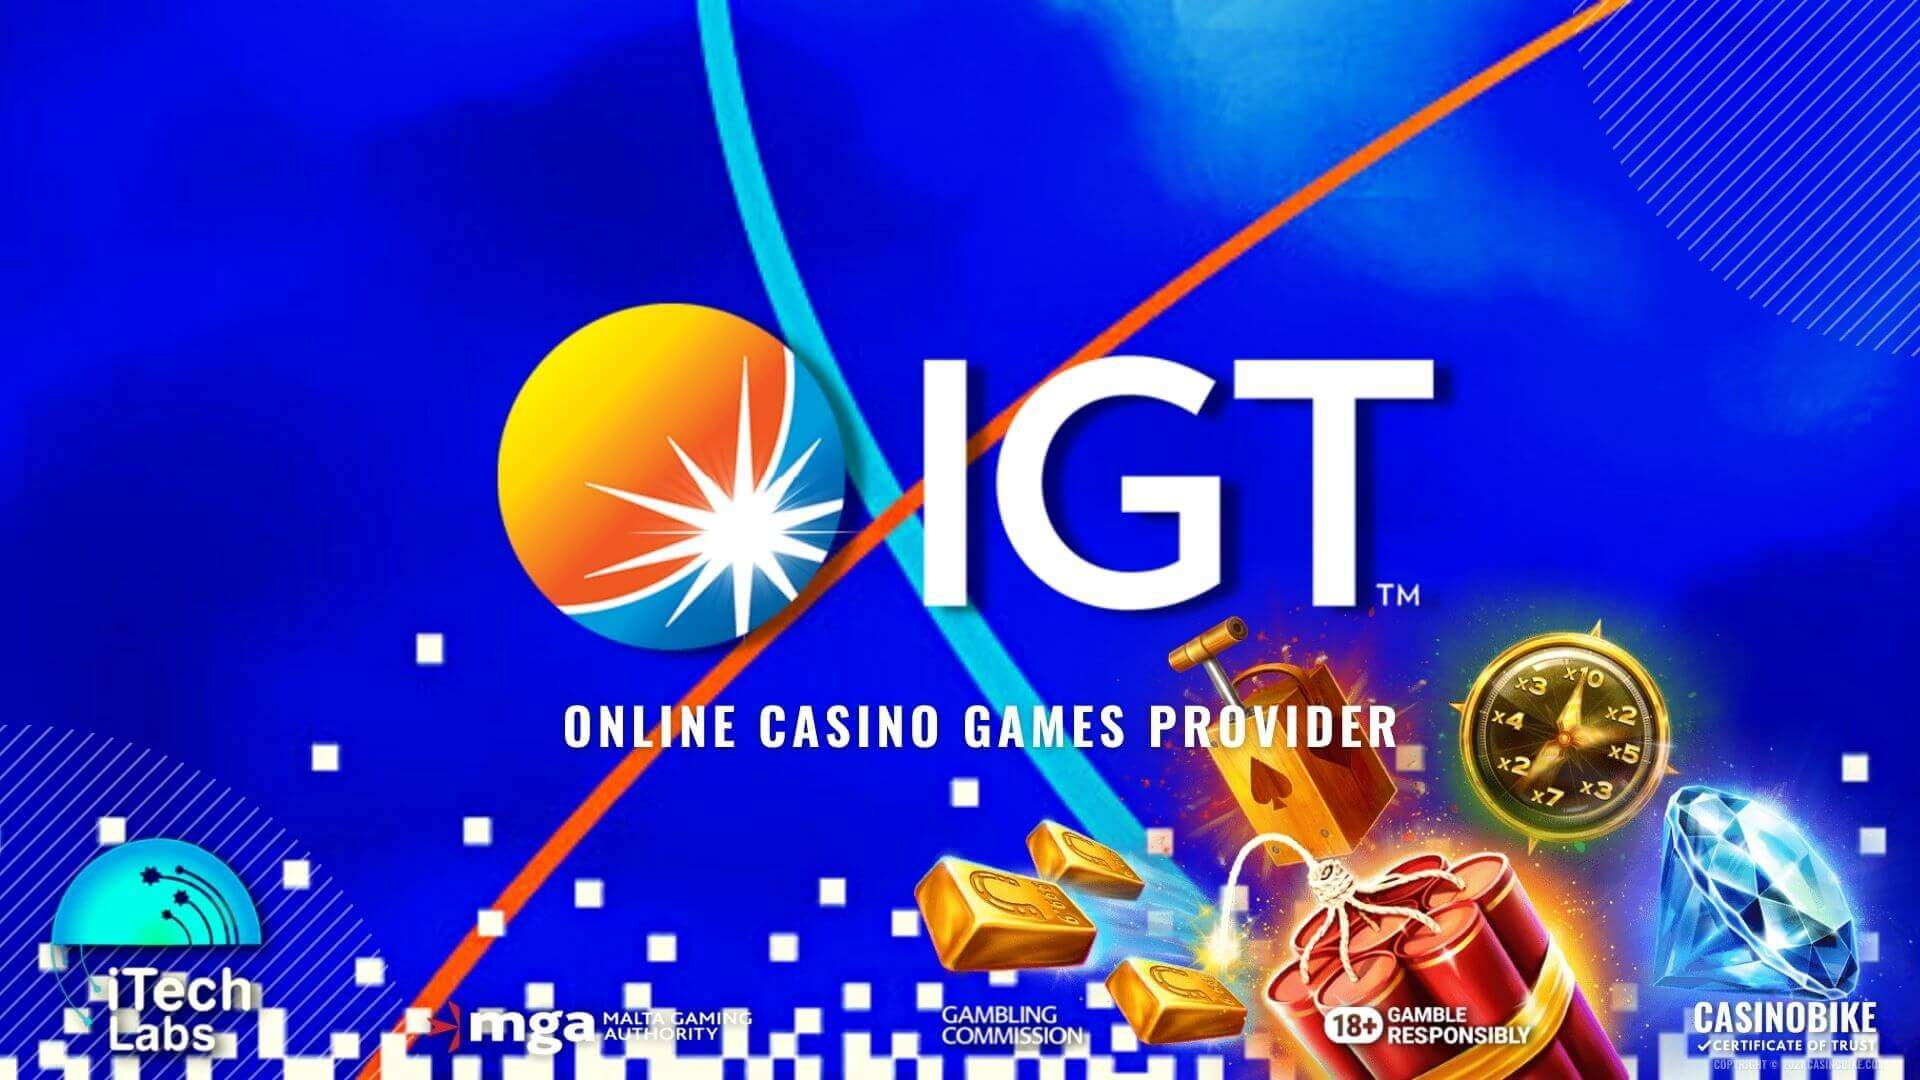 IGT Online Casino Software Provider